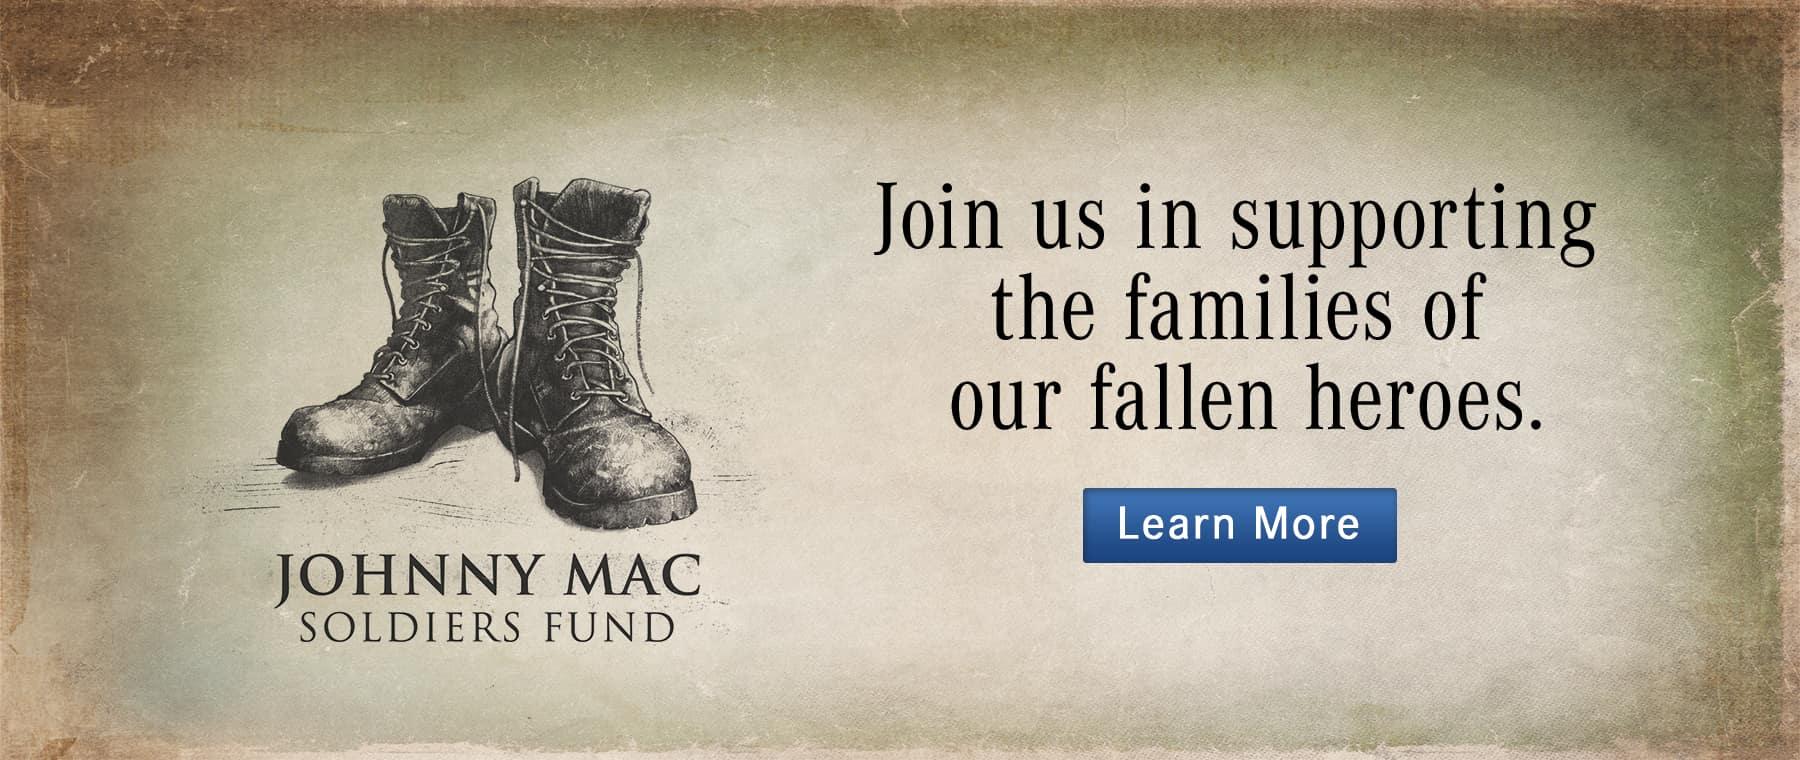 Johnny Mac_Support Us_Dealer Website Banners_1800x760